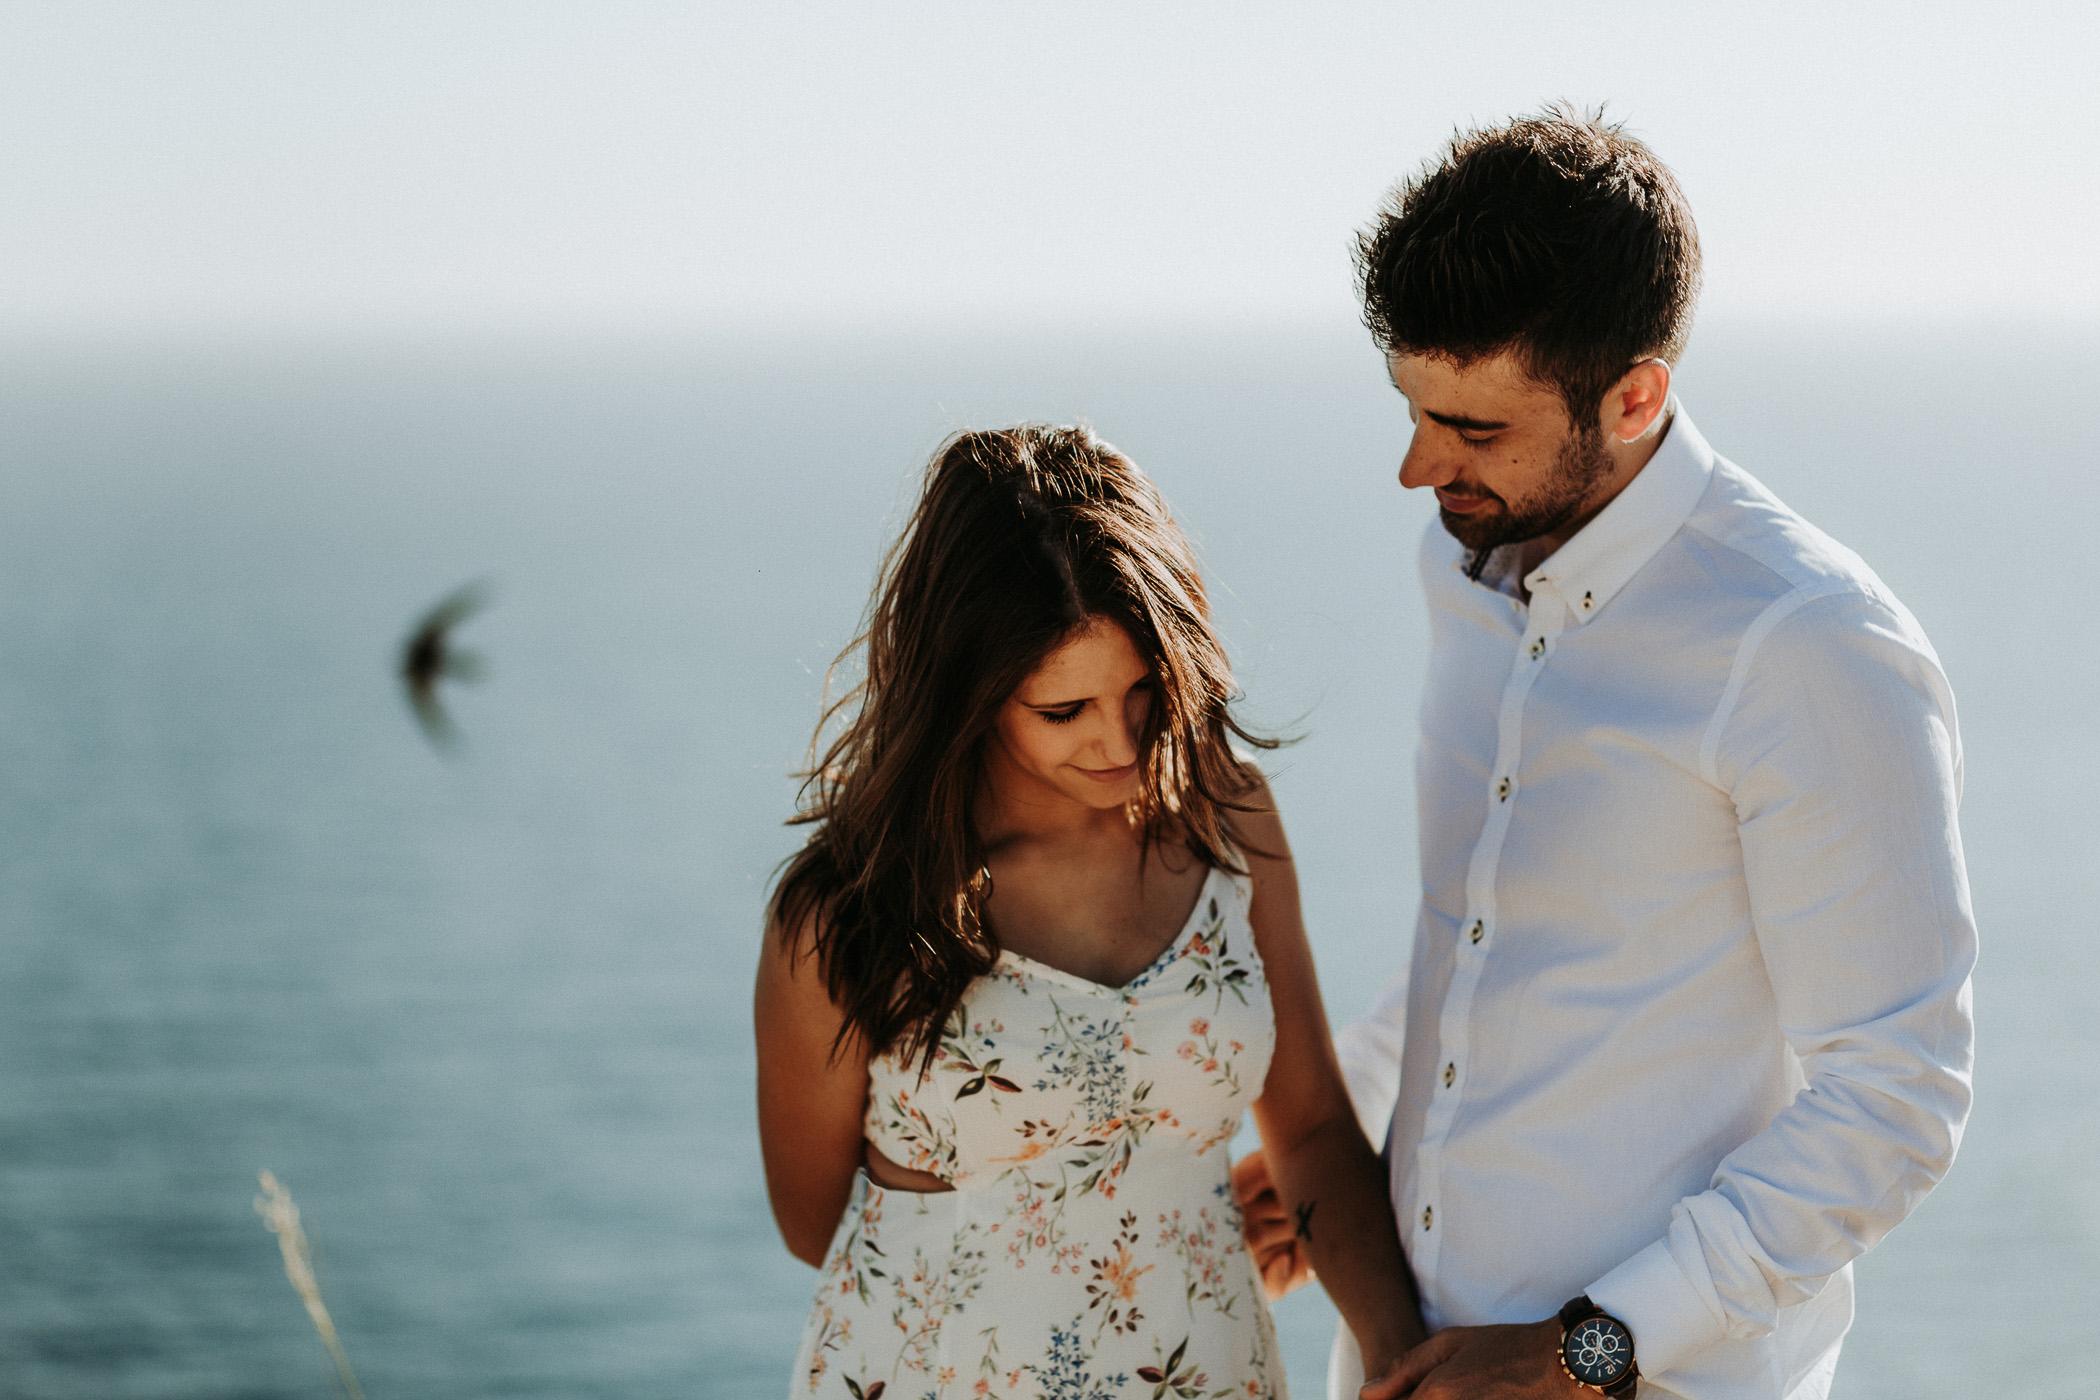 DanielaMarquardtPhotography_wedding_elopement_mallorca_spain_calapi_palma_lauraandtoni_177